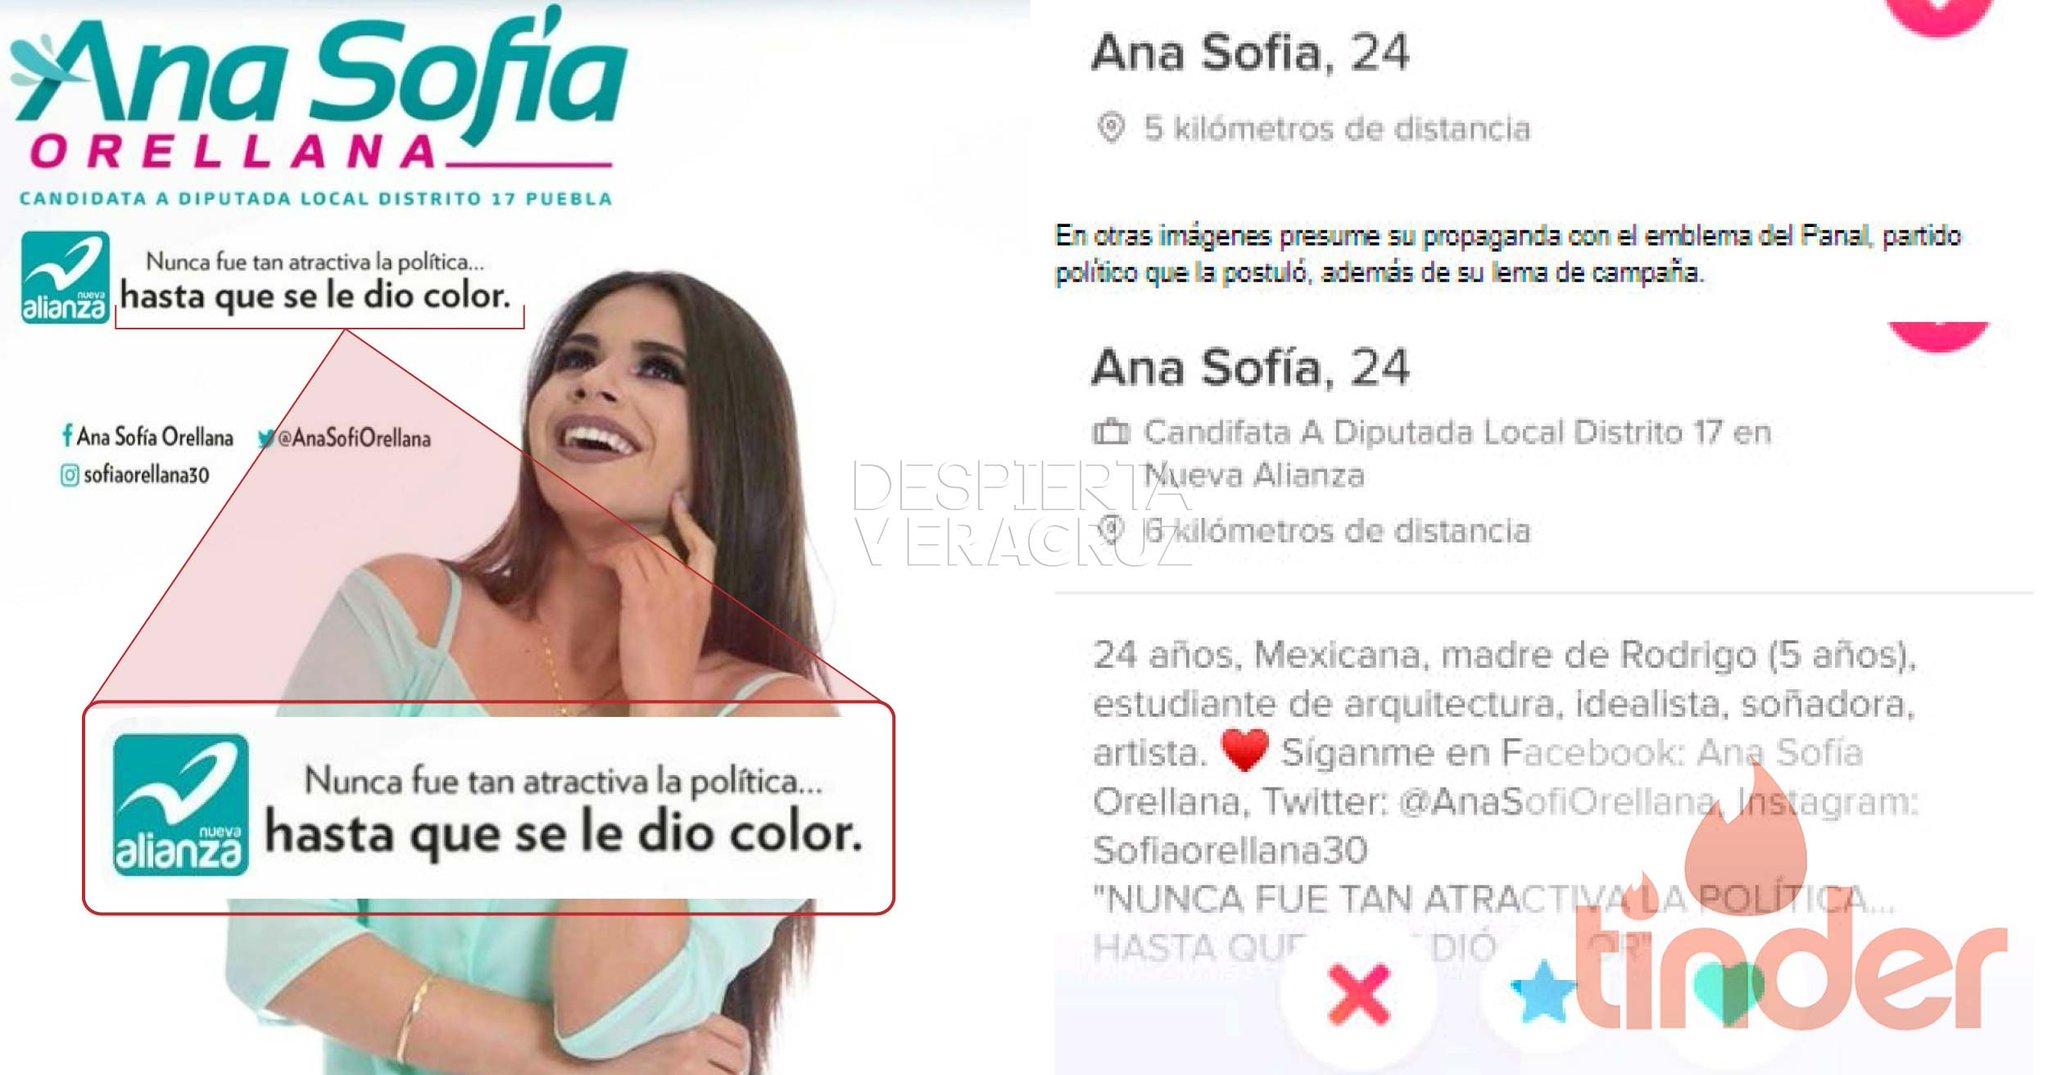 "Ana Sofía Orellana despierta veracruz в twitter: ""#tendencias ana sofía"